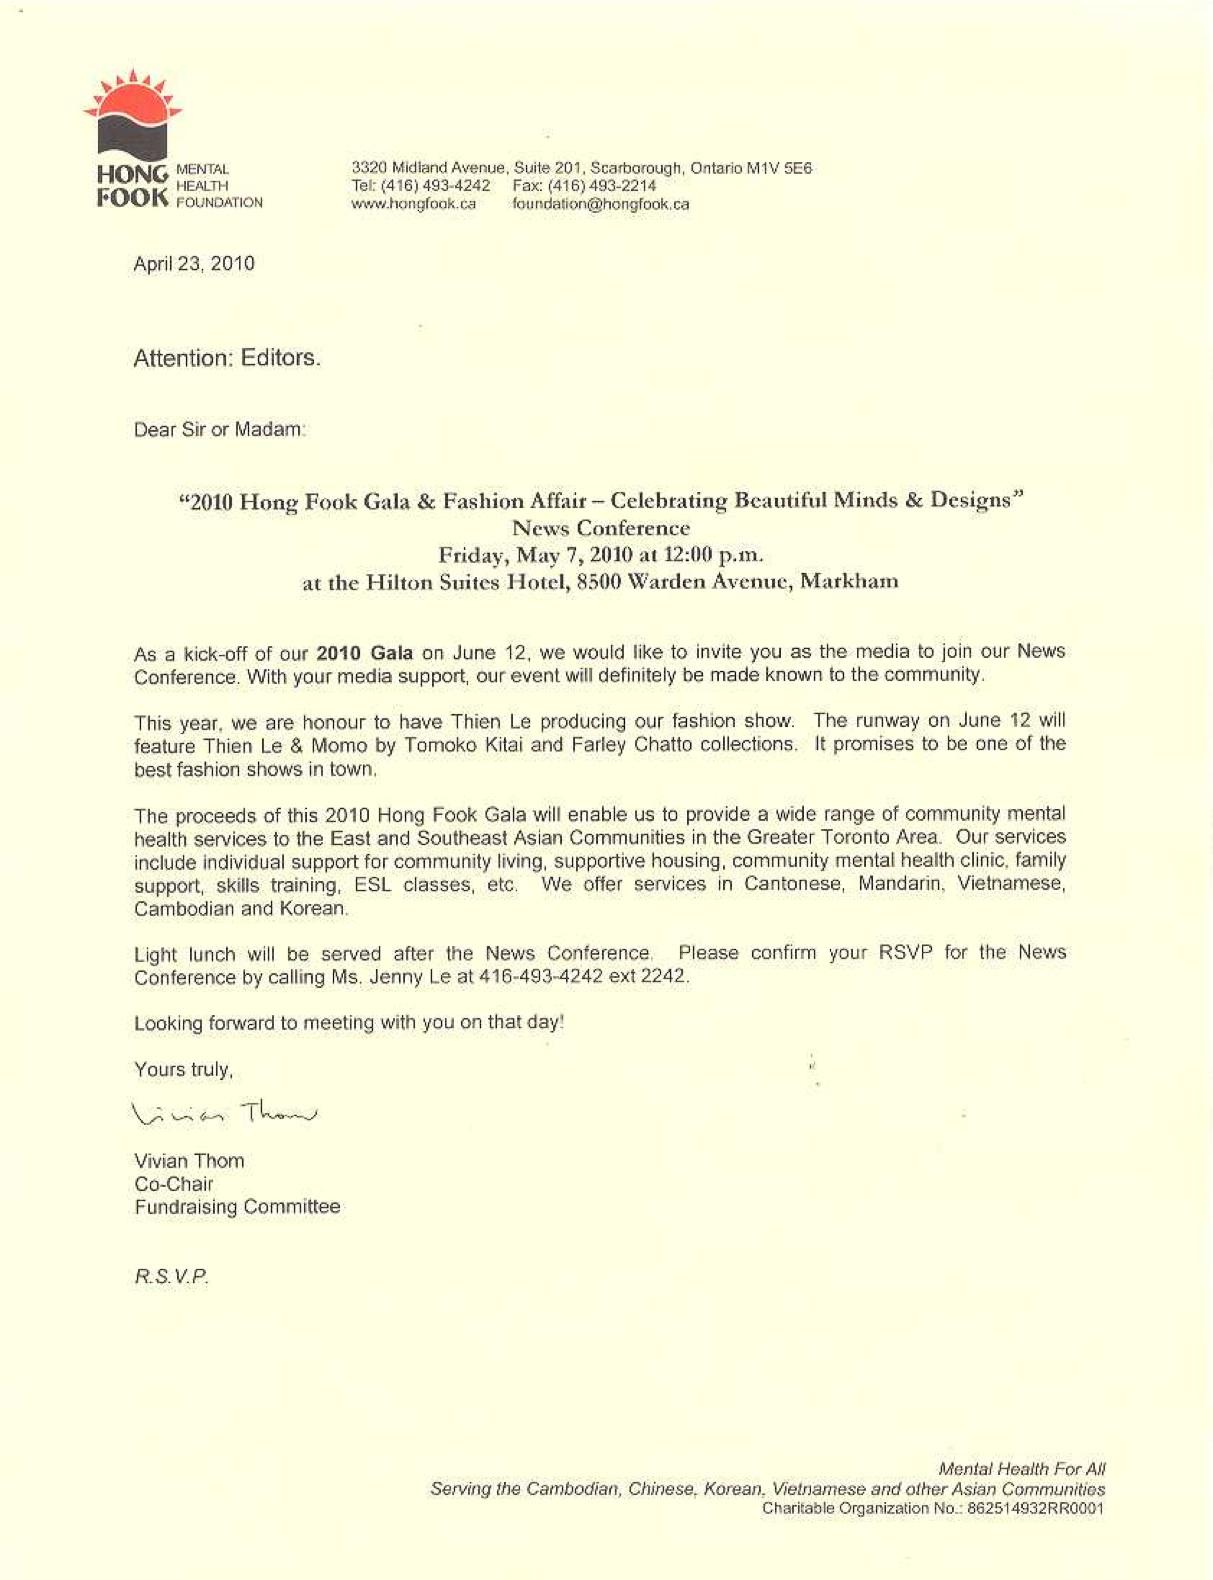 Invitation letter generator 28 images invitation letter for invitation letter generator sle invitation letter chief guest inauguration invitation letter sle guest speaker stopboris Gallery